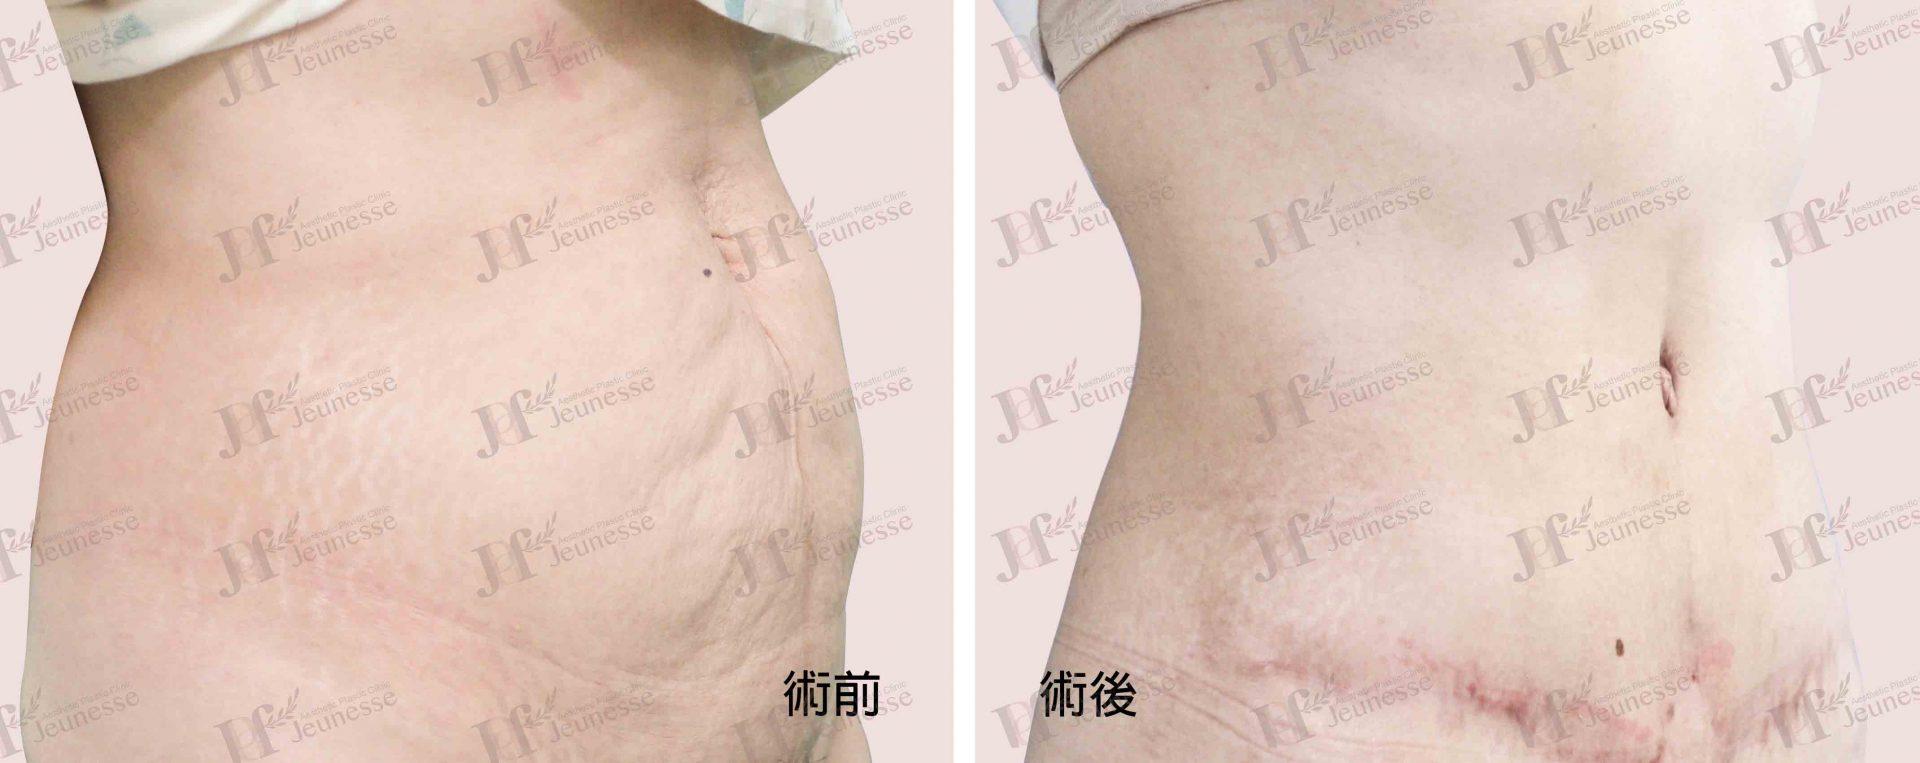 Abdominoplasty腹部成形術及抽脂手術 case 1 45度-浮水印